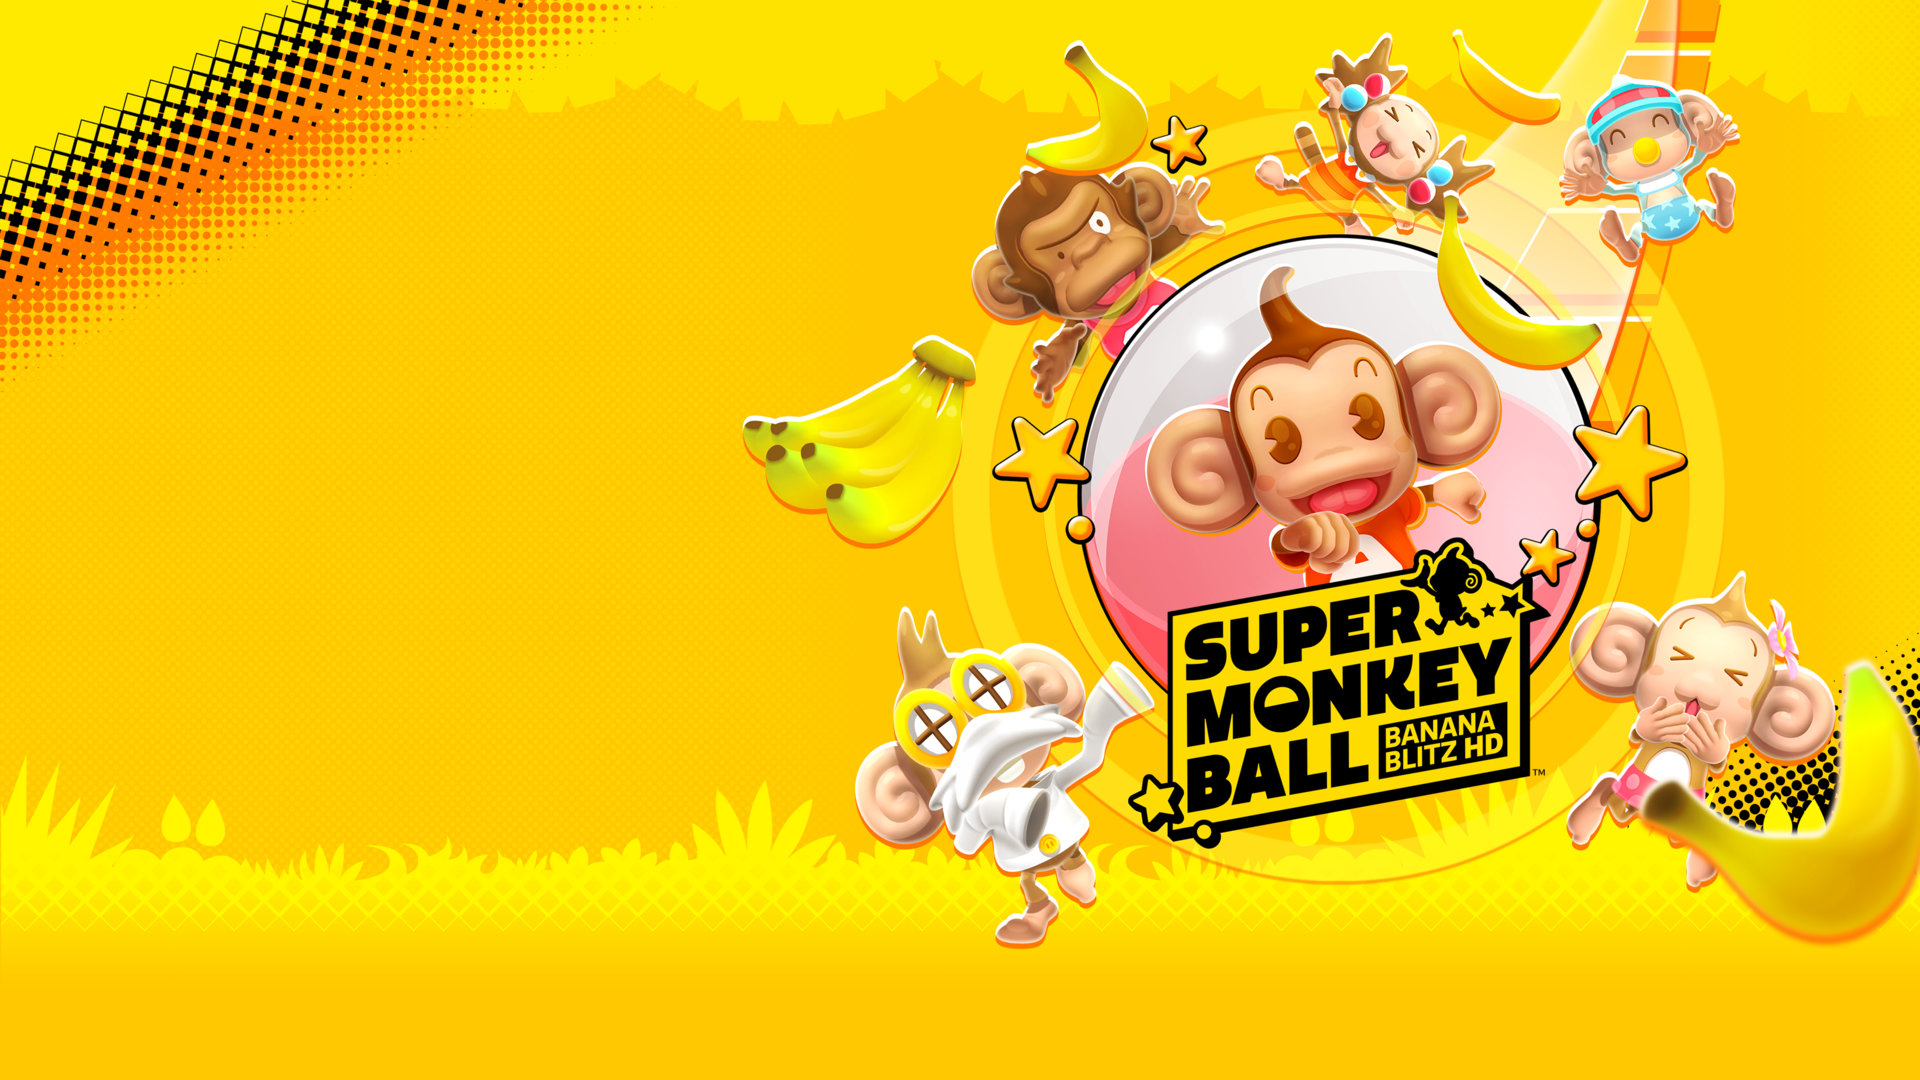 Super Monkey Ball Banana Blitz HD (English/Chinese/Korean/Japanese Ver.)